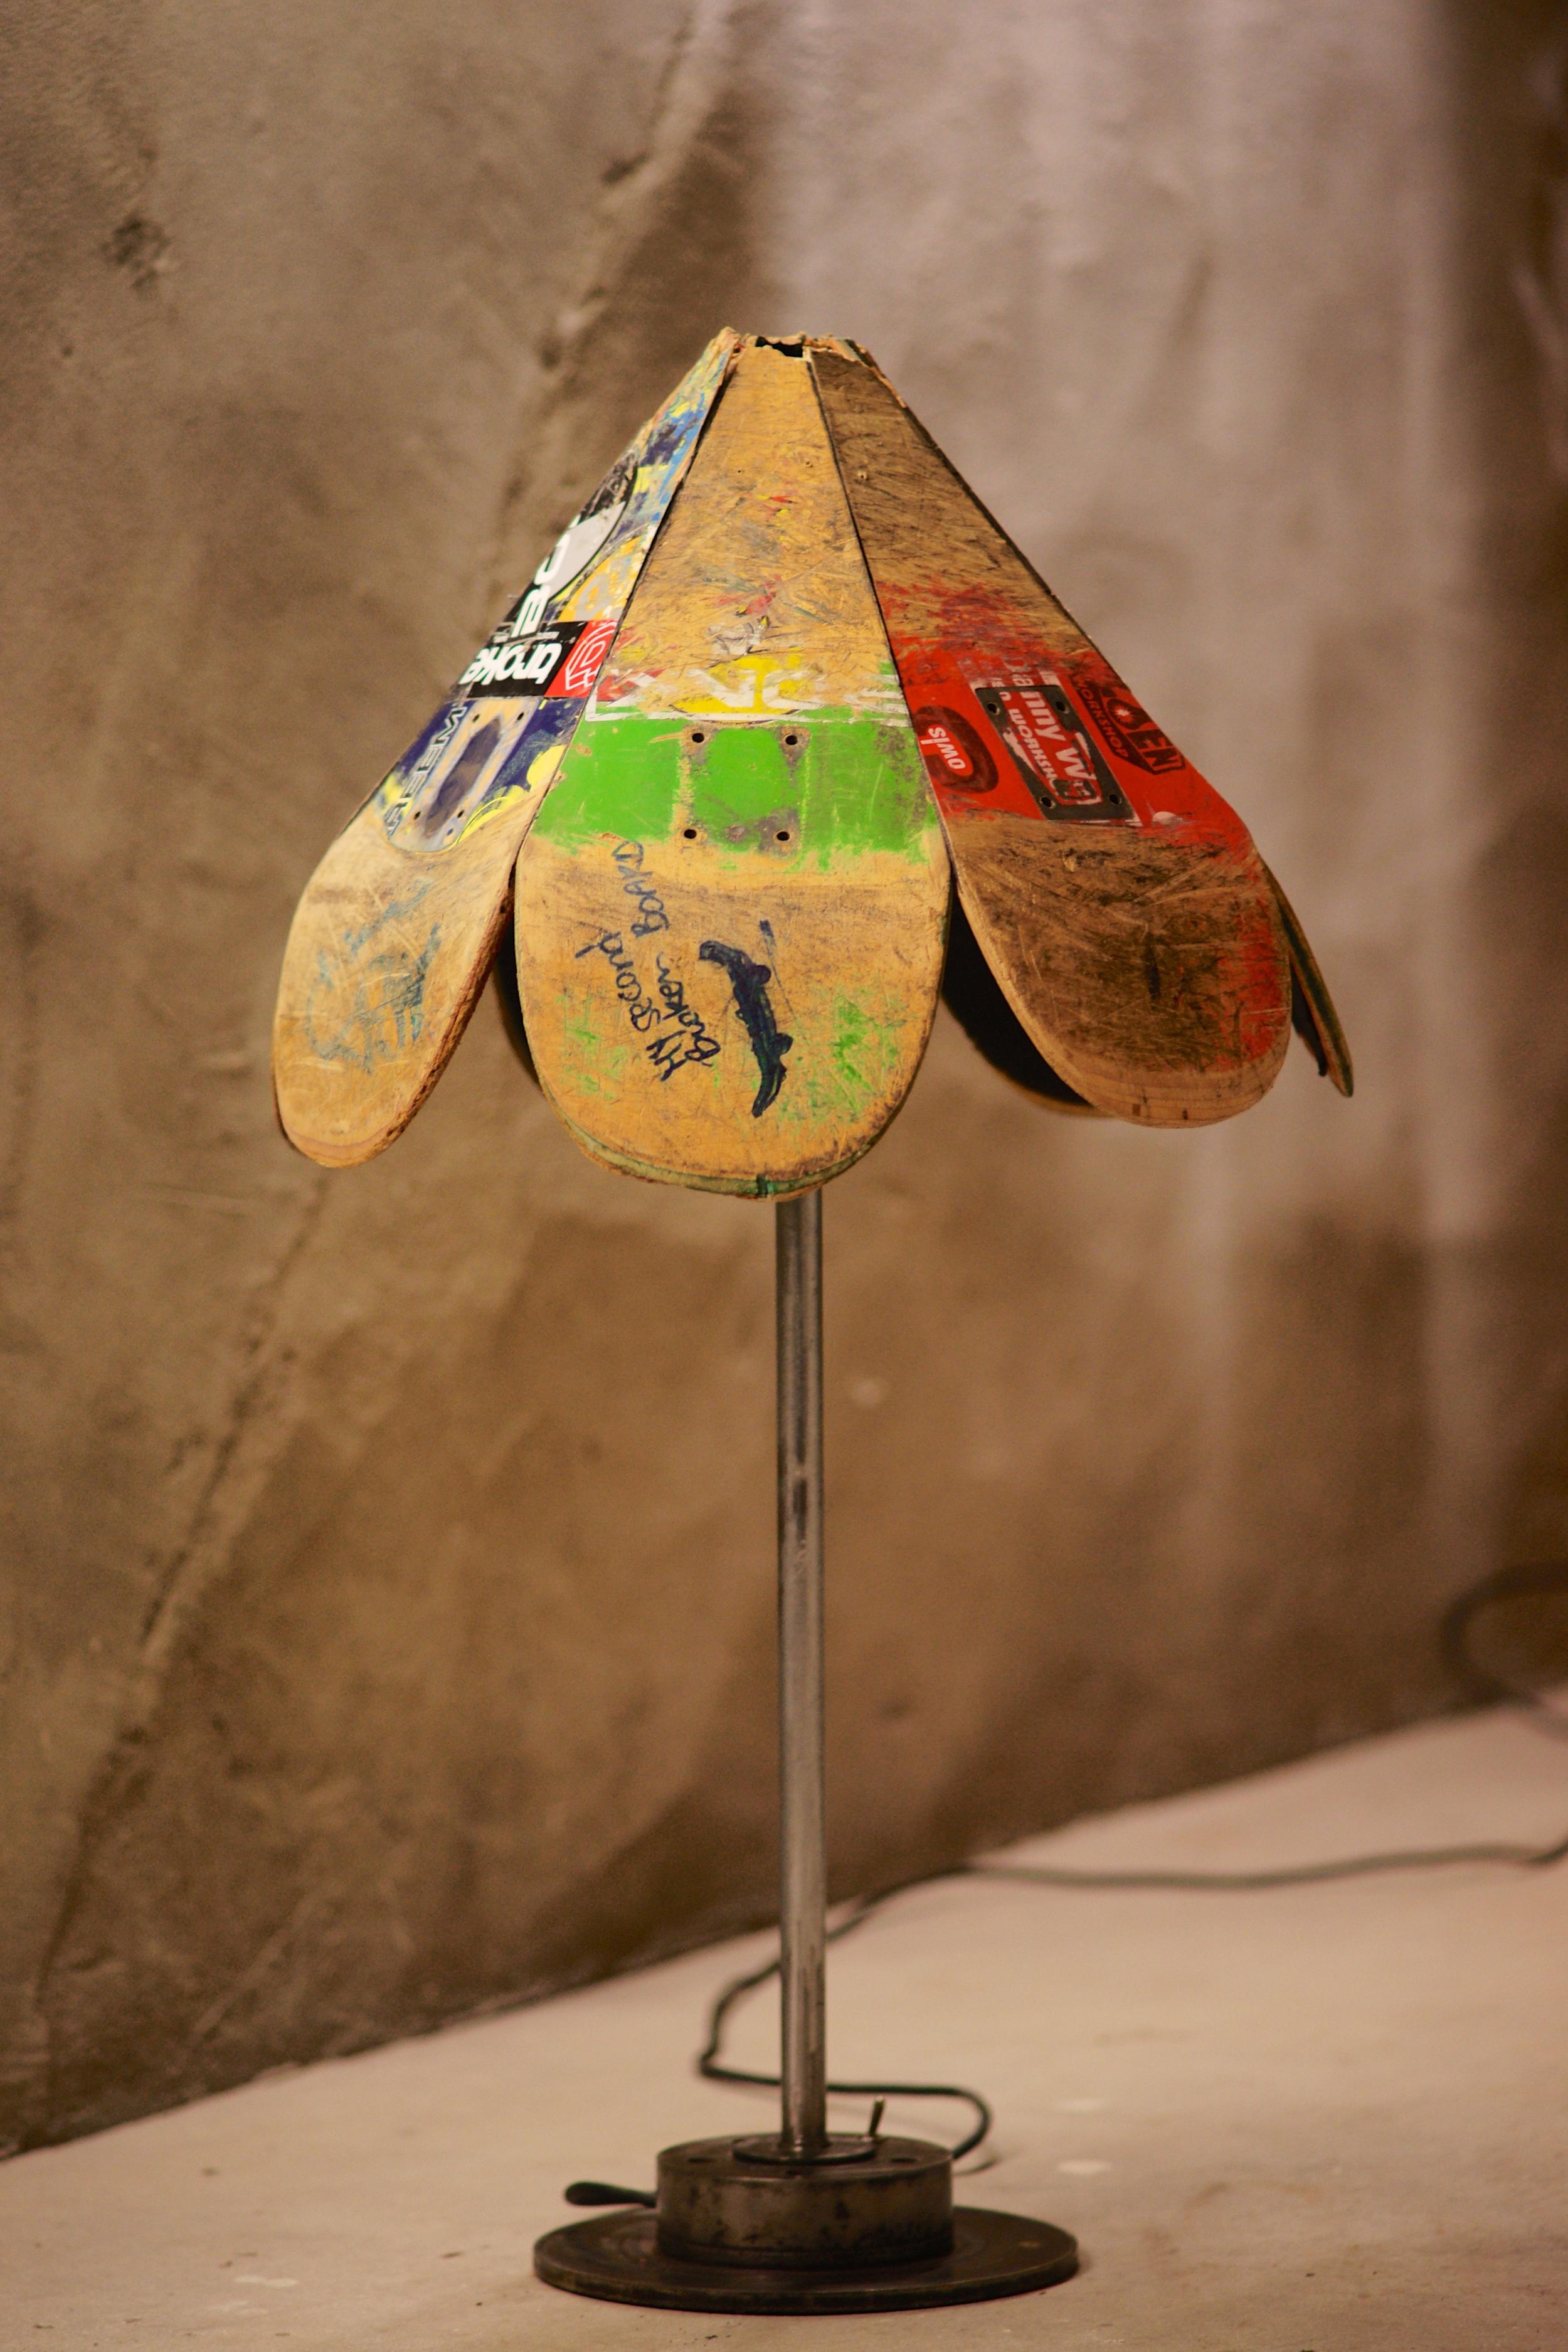 Skate Table Lamp